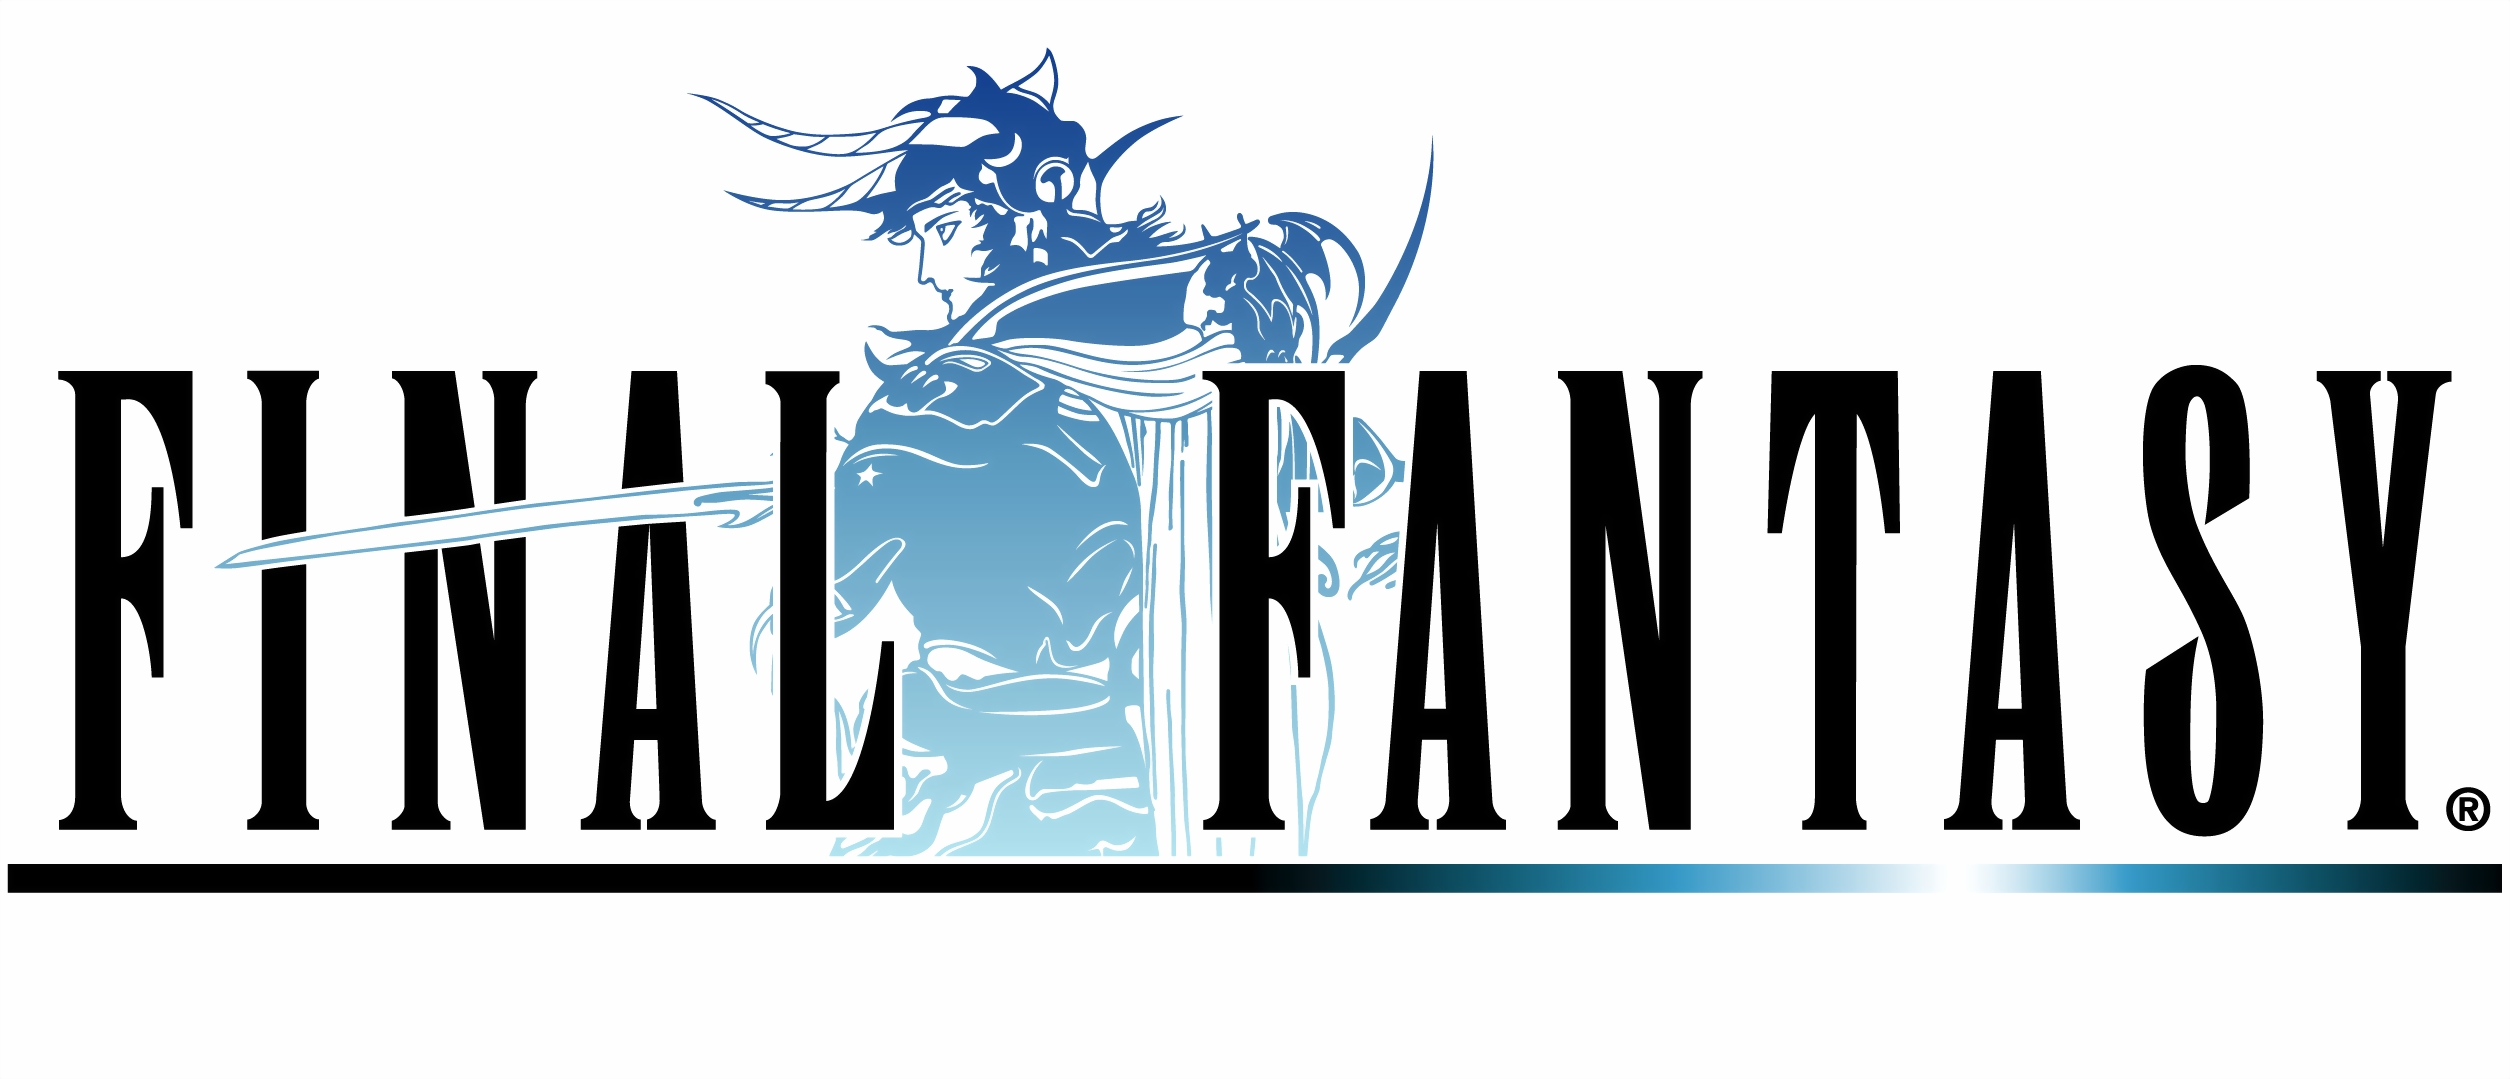 What killed u0027Final Fantasyu0027